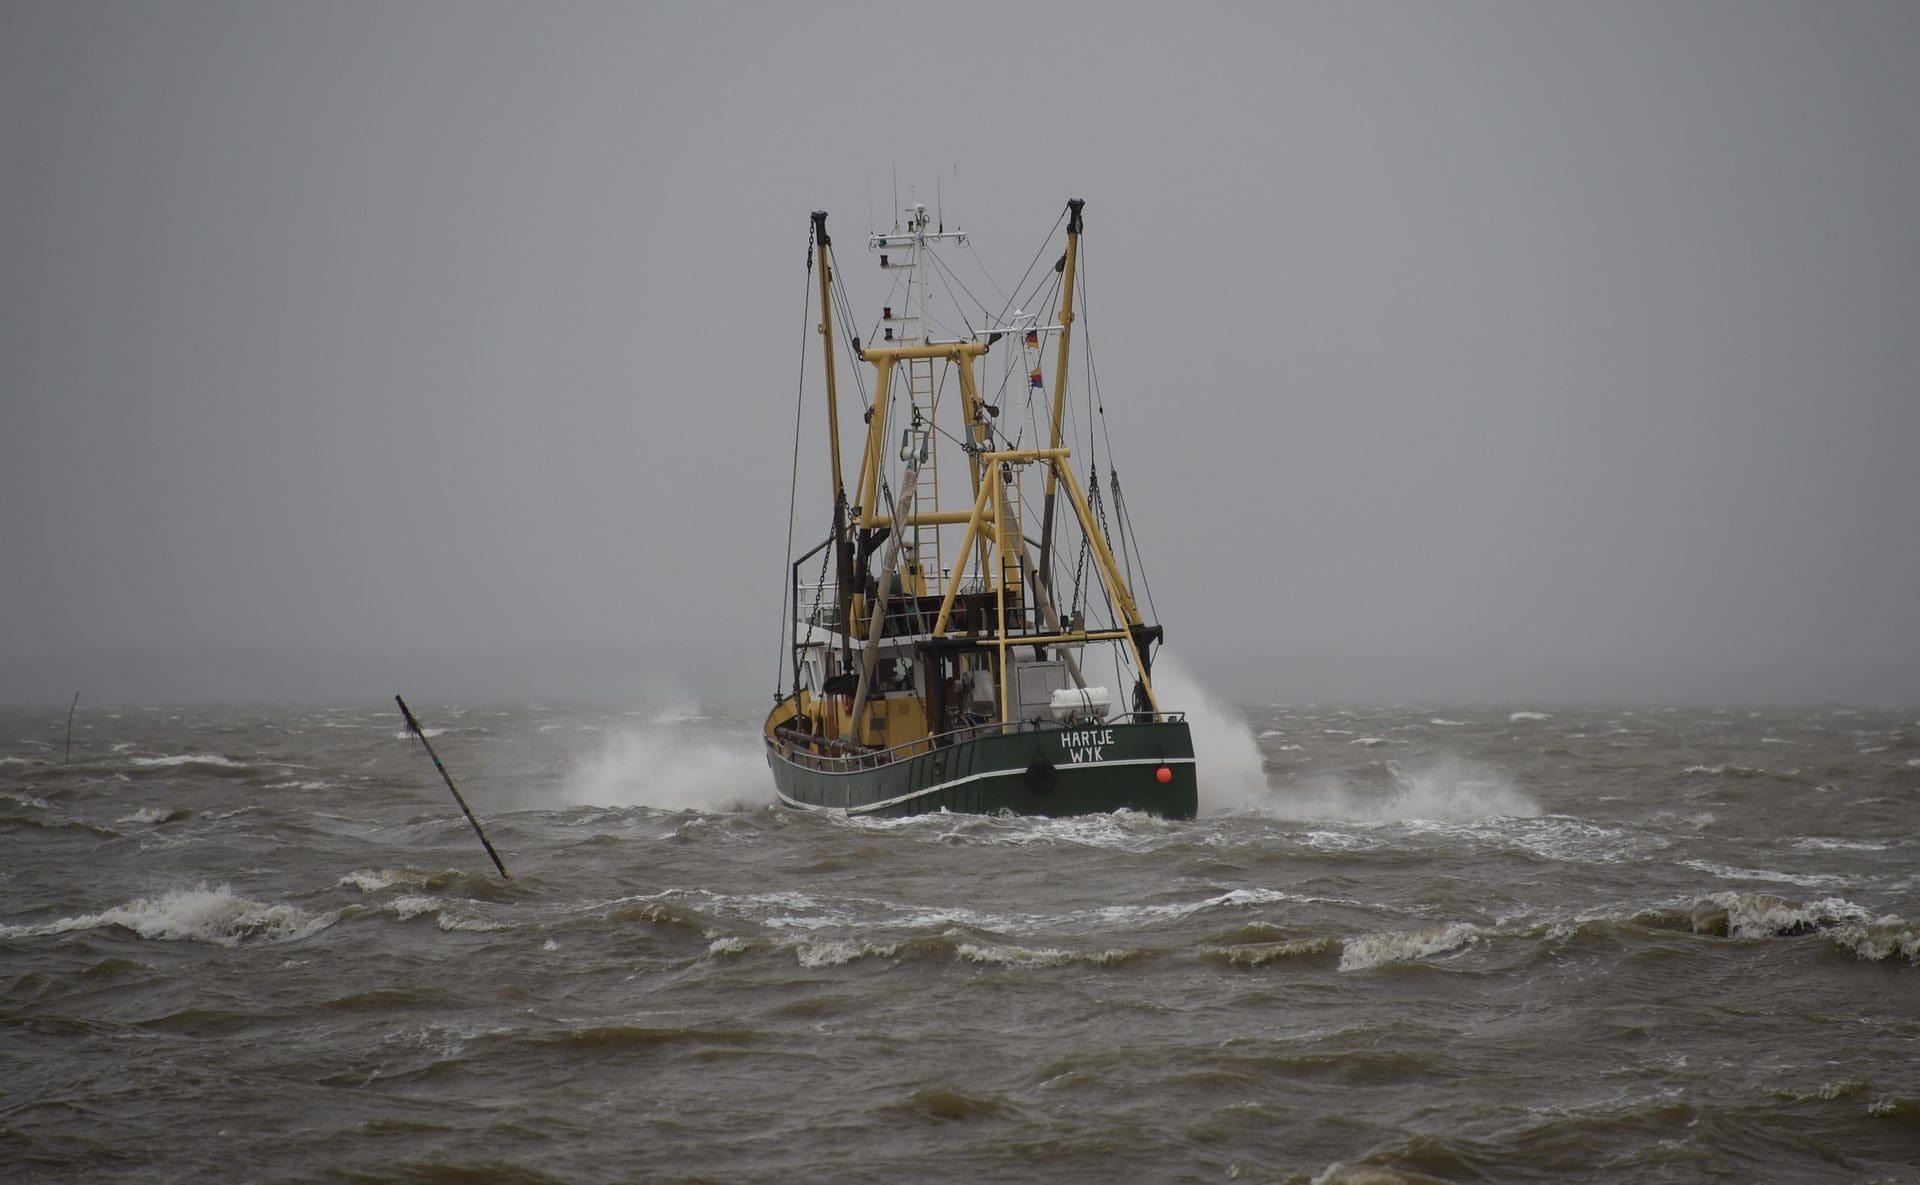 EU-Verhandlungen über Nordsee-Fangquoten stocken Agrarminister in Brüssel